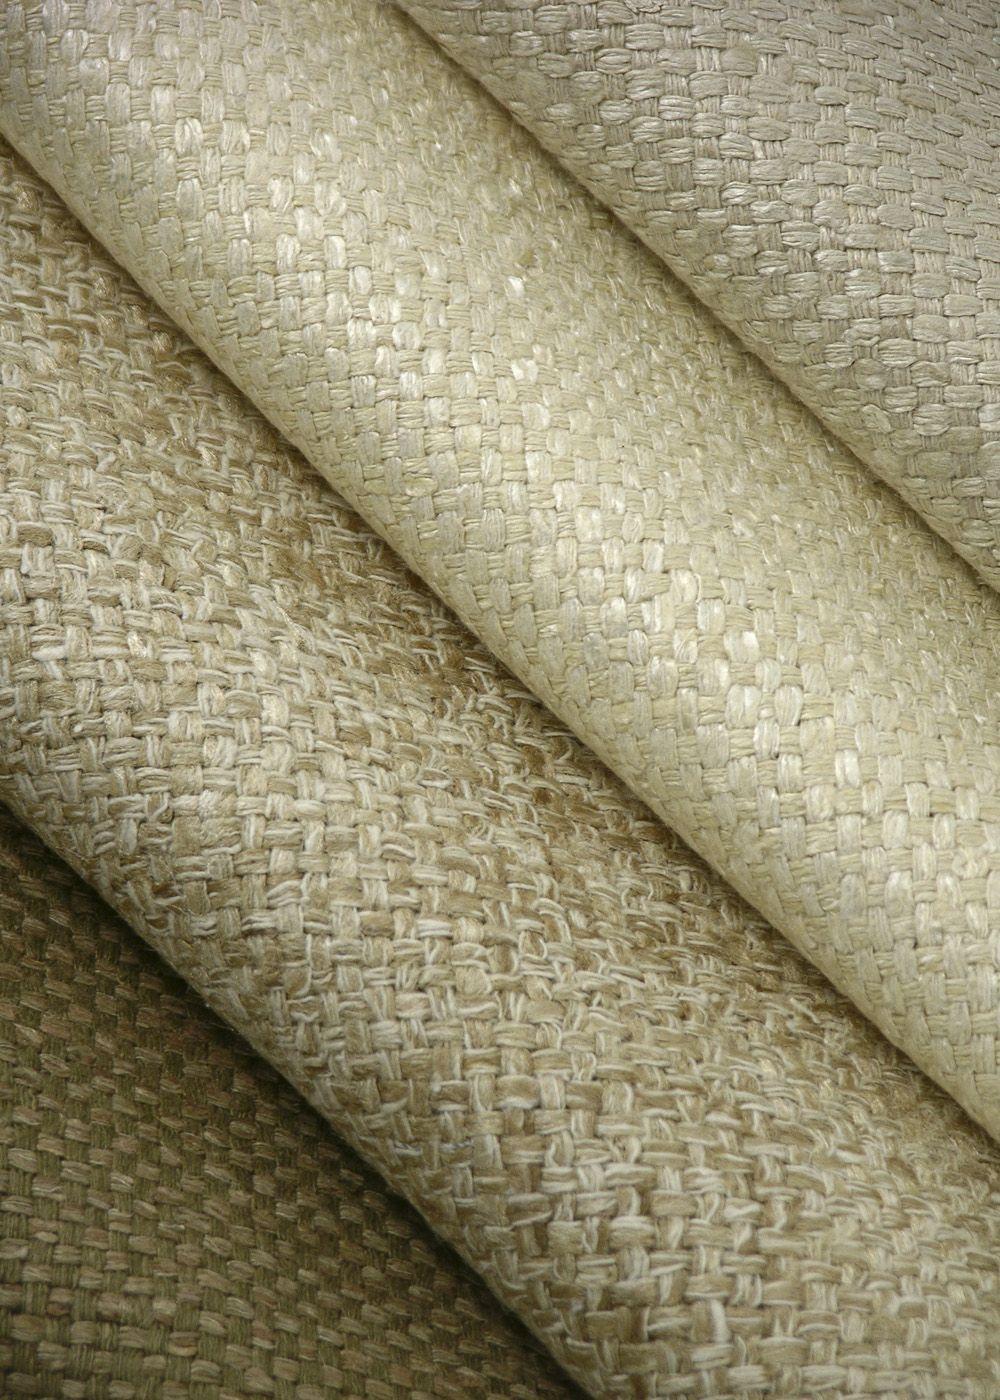 Woven Silk (#5548) by Rose Cumming | Silk: 100% | Dessin Fournir Companies